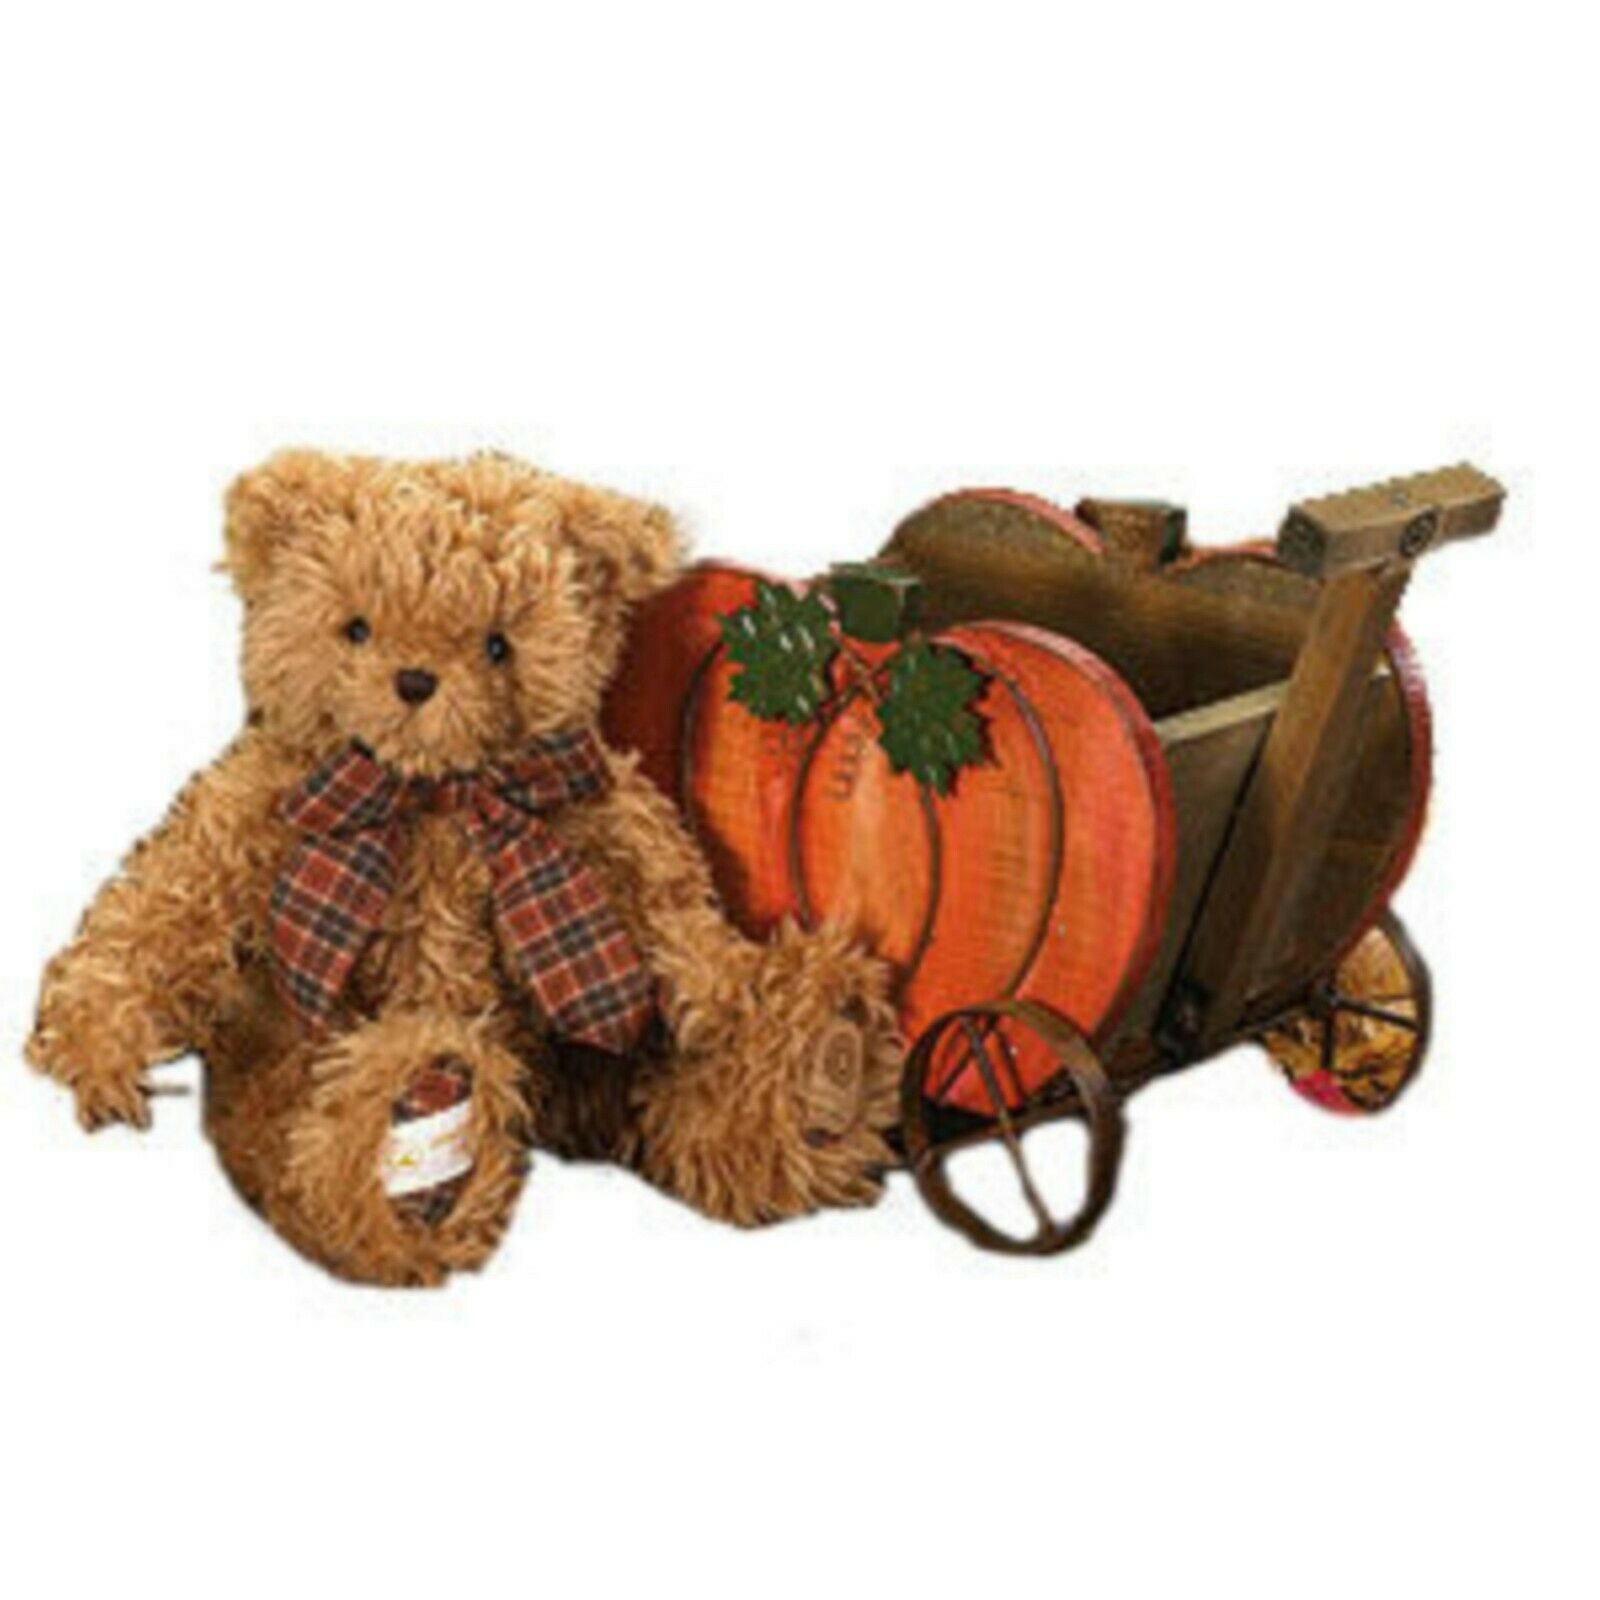 "Boyds Bears ""Mr Pumpkins"" 12"" Bear of Month- Nov 2008- #4012908- New - $69.99"